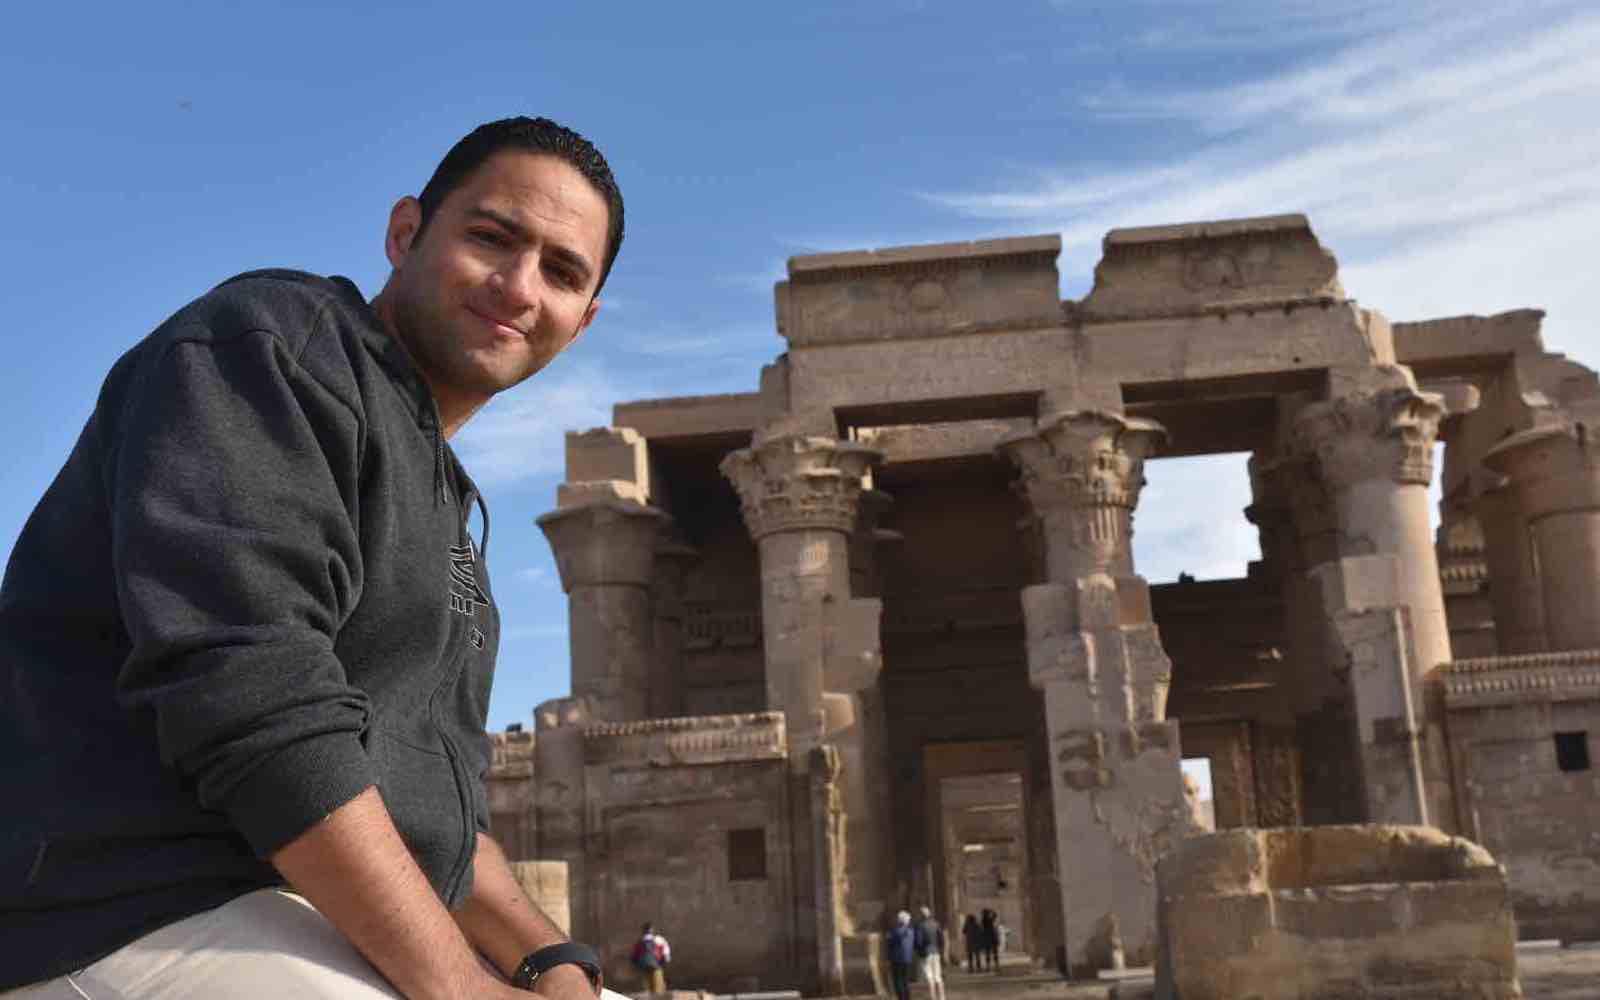 Local advice: Cairo safe and never sleep